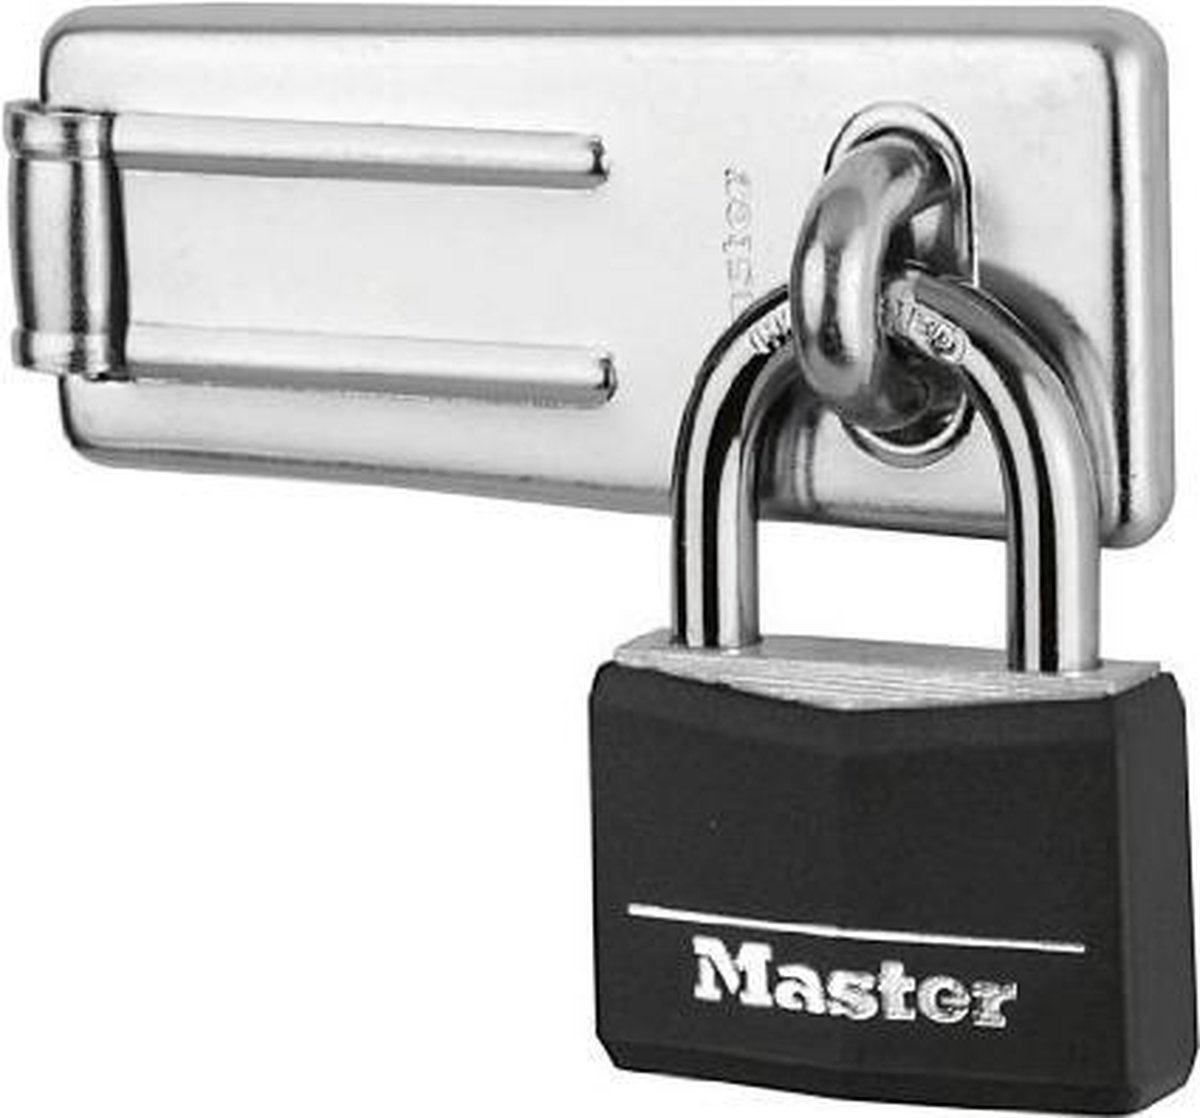 MasterLock Overvalslot + Hangslot - 9140703EURDBLK - MasterLock